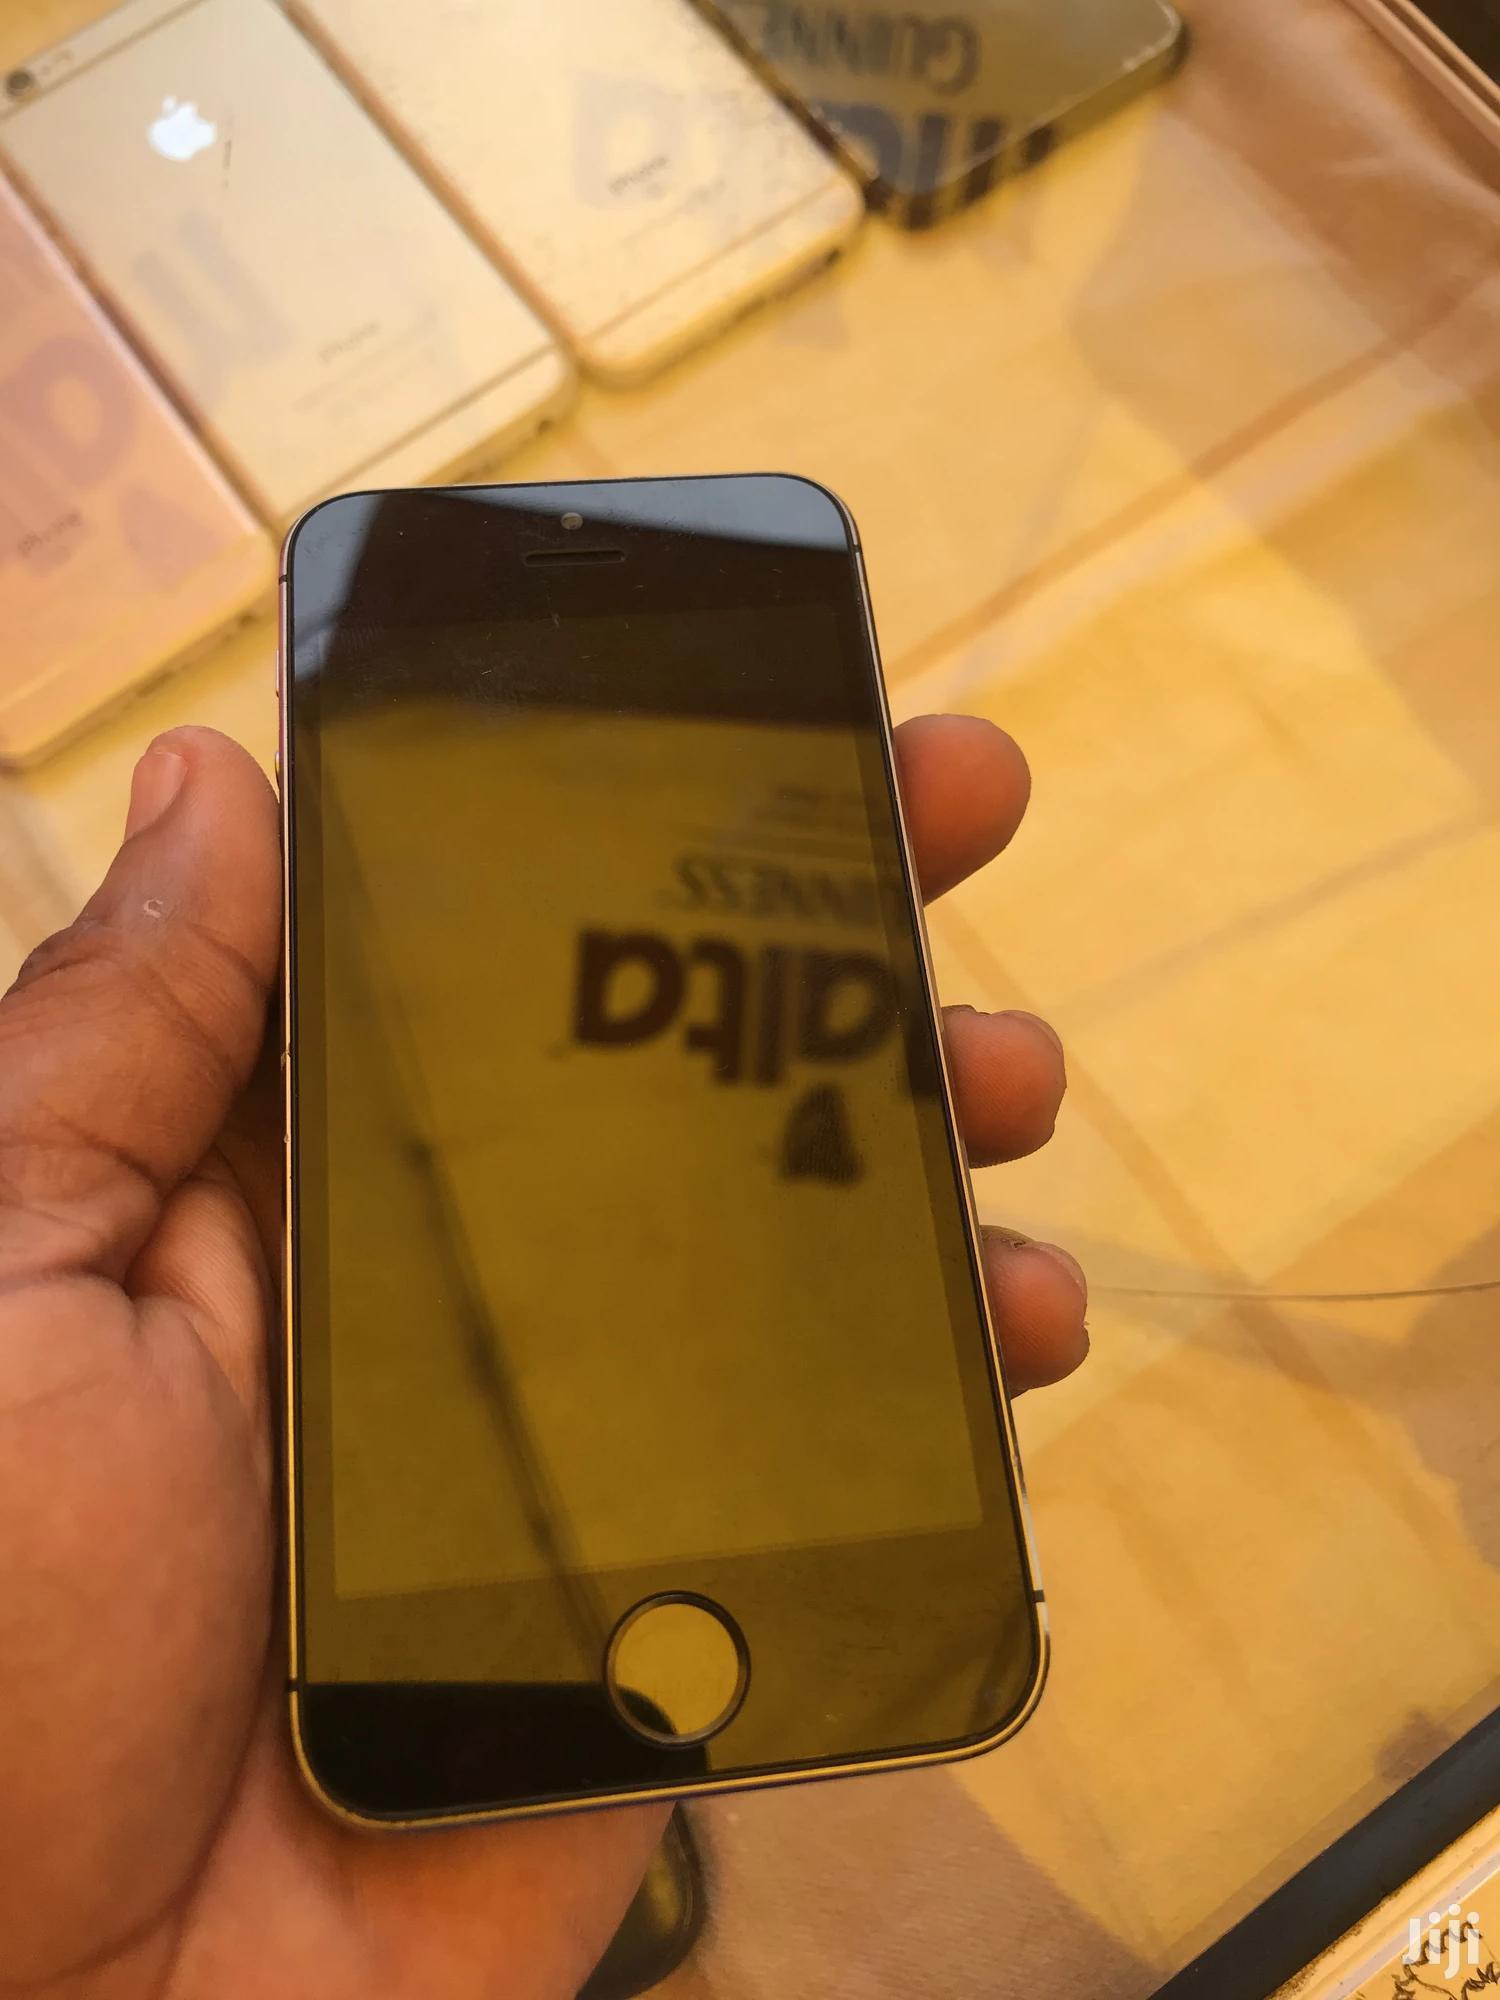 Apple iPhone 5s 16 GB Black | Mobile Phones for sale in Odorkor, Greater Accra, Ghana